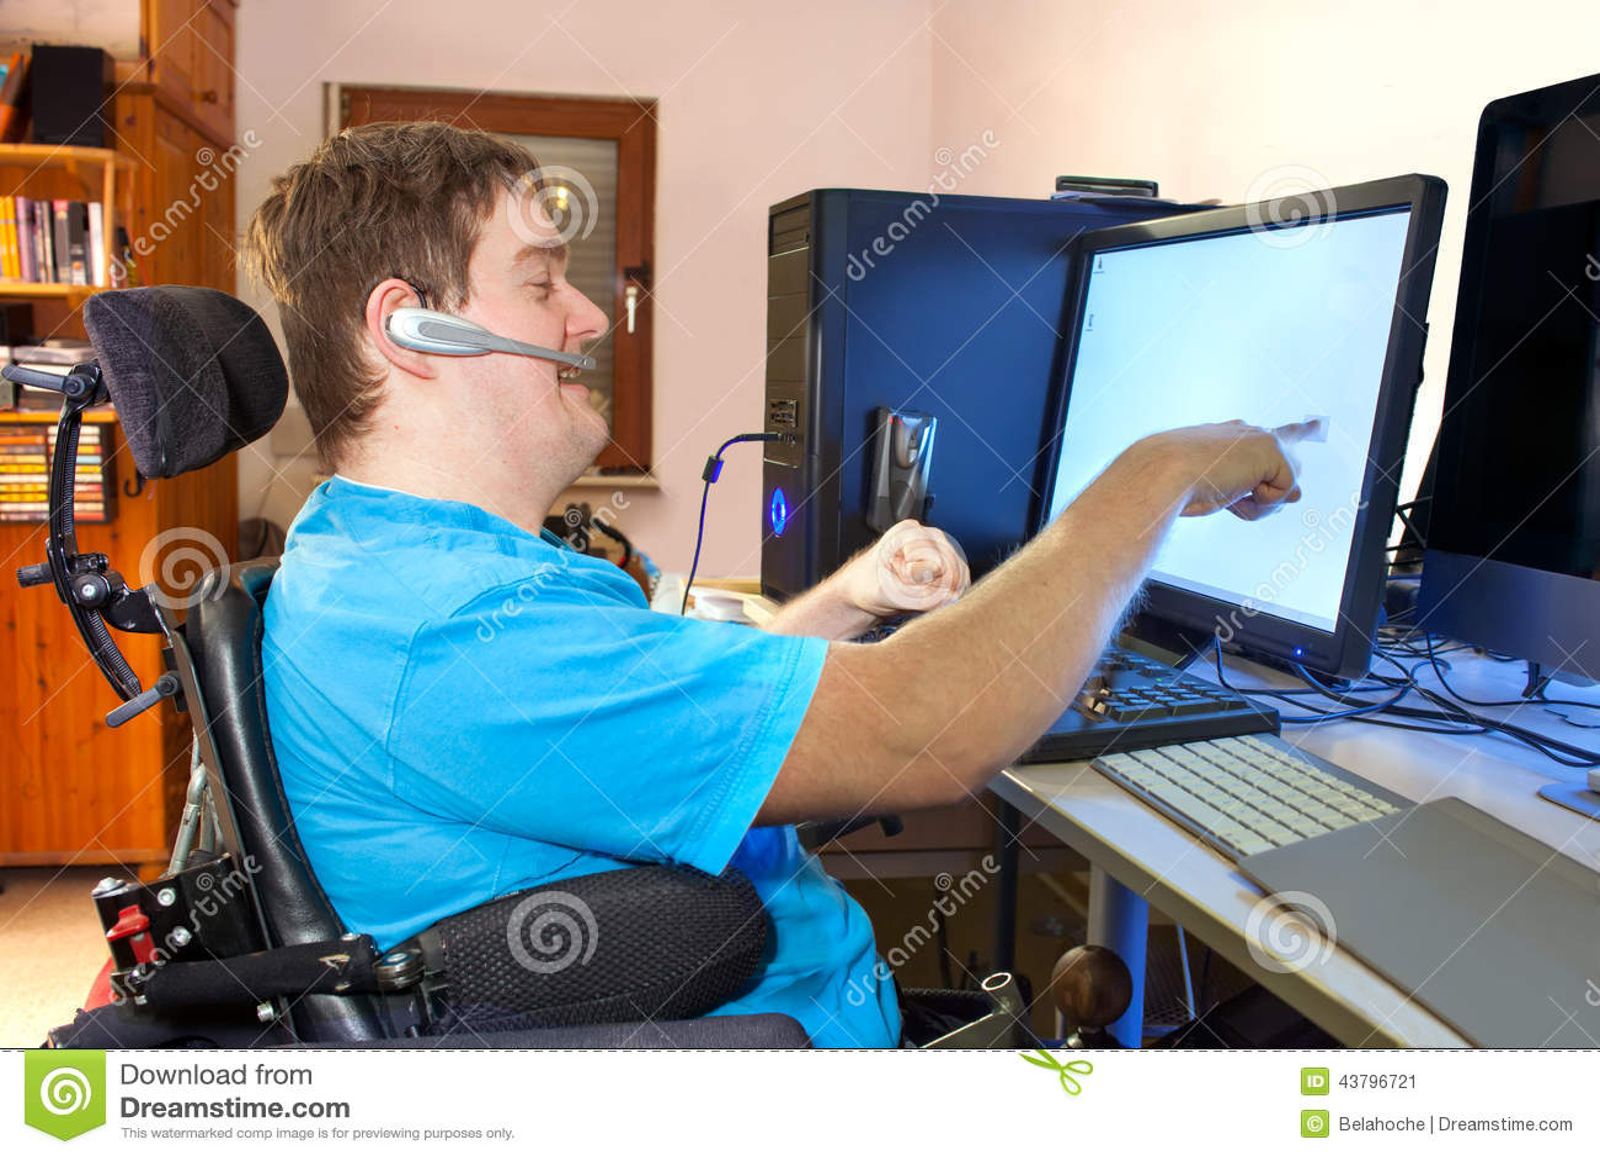 Hombre con parálisis cerebral infantil usando un ordenador